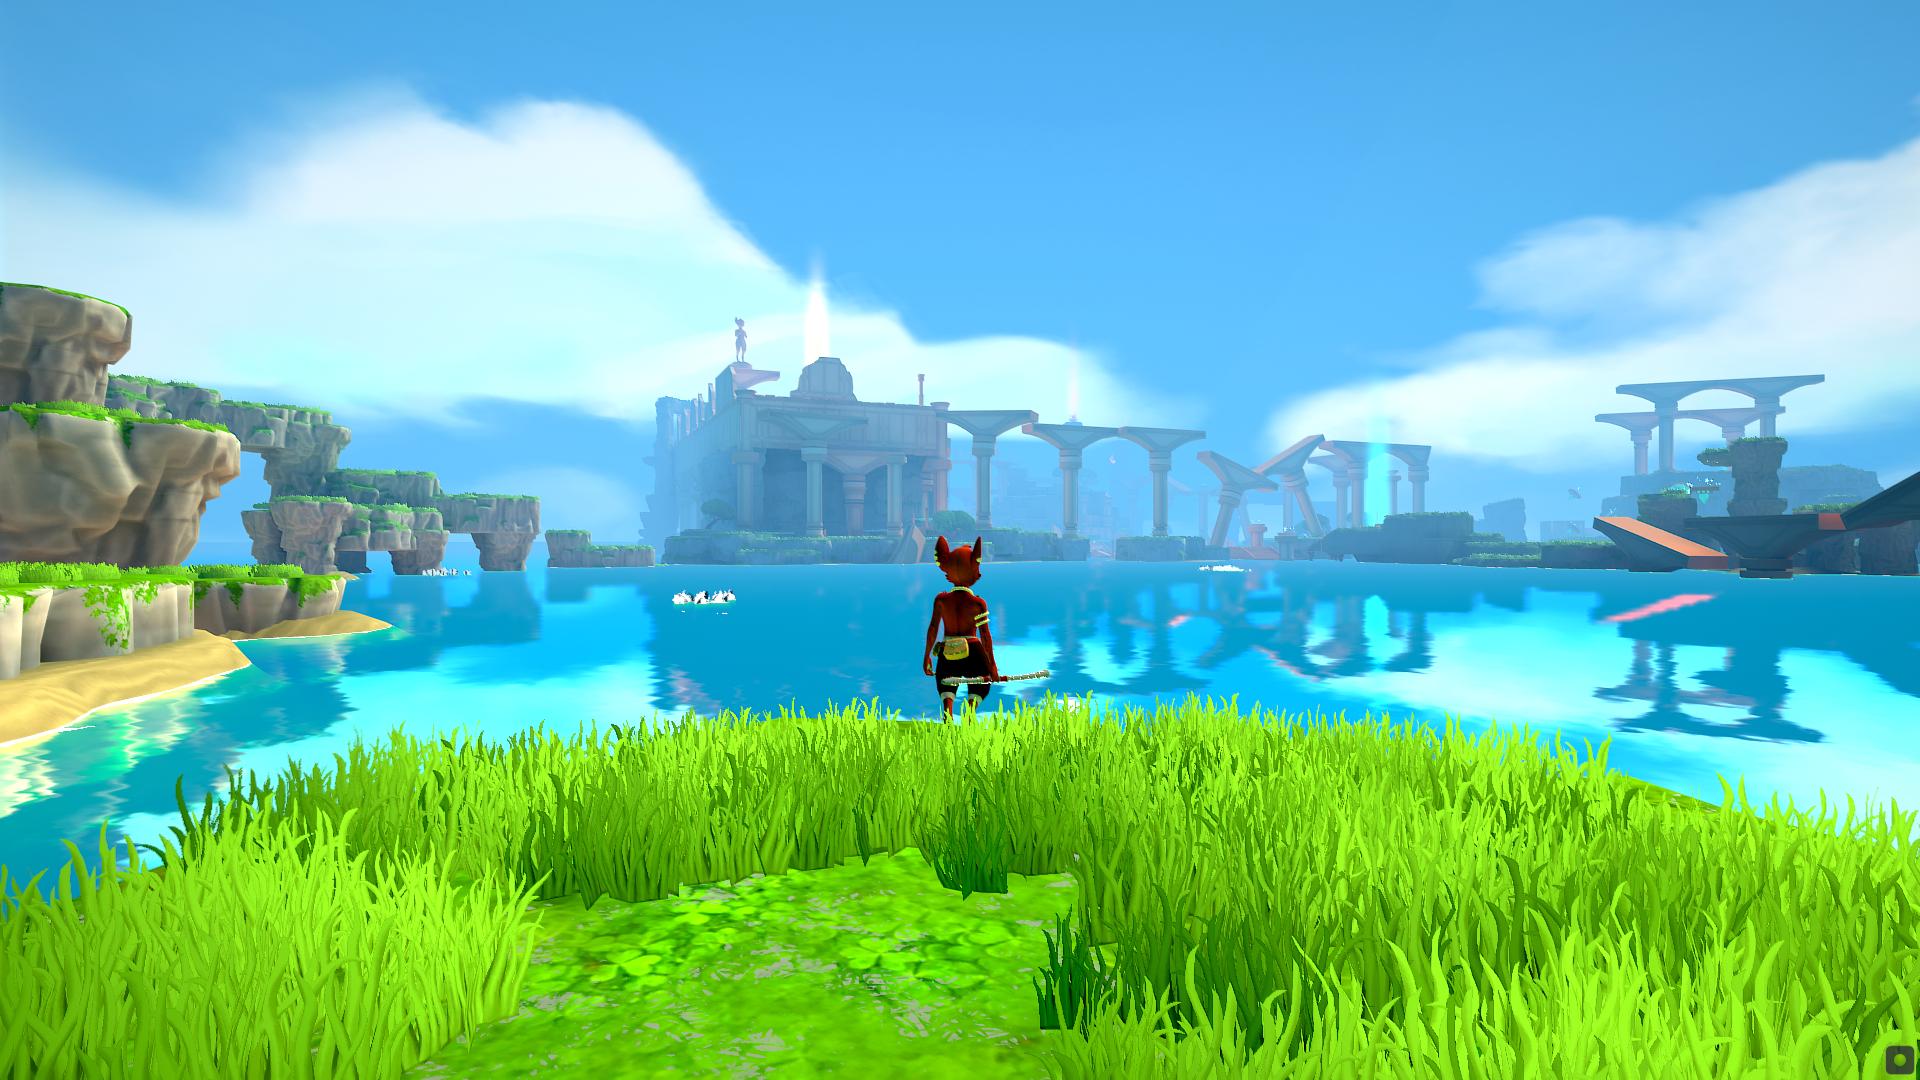 Screenshot (116).png